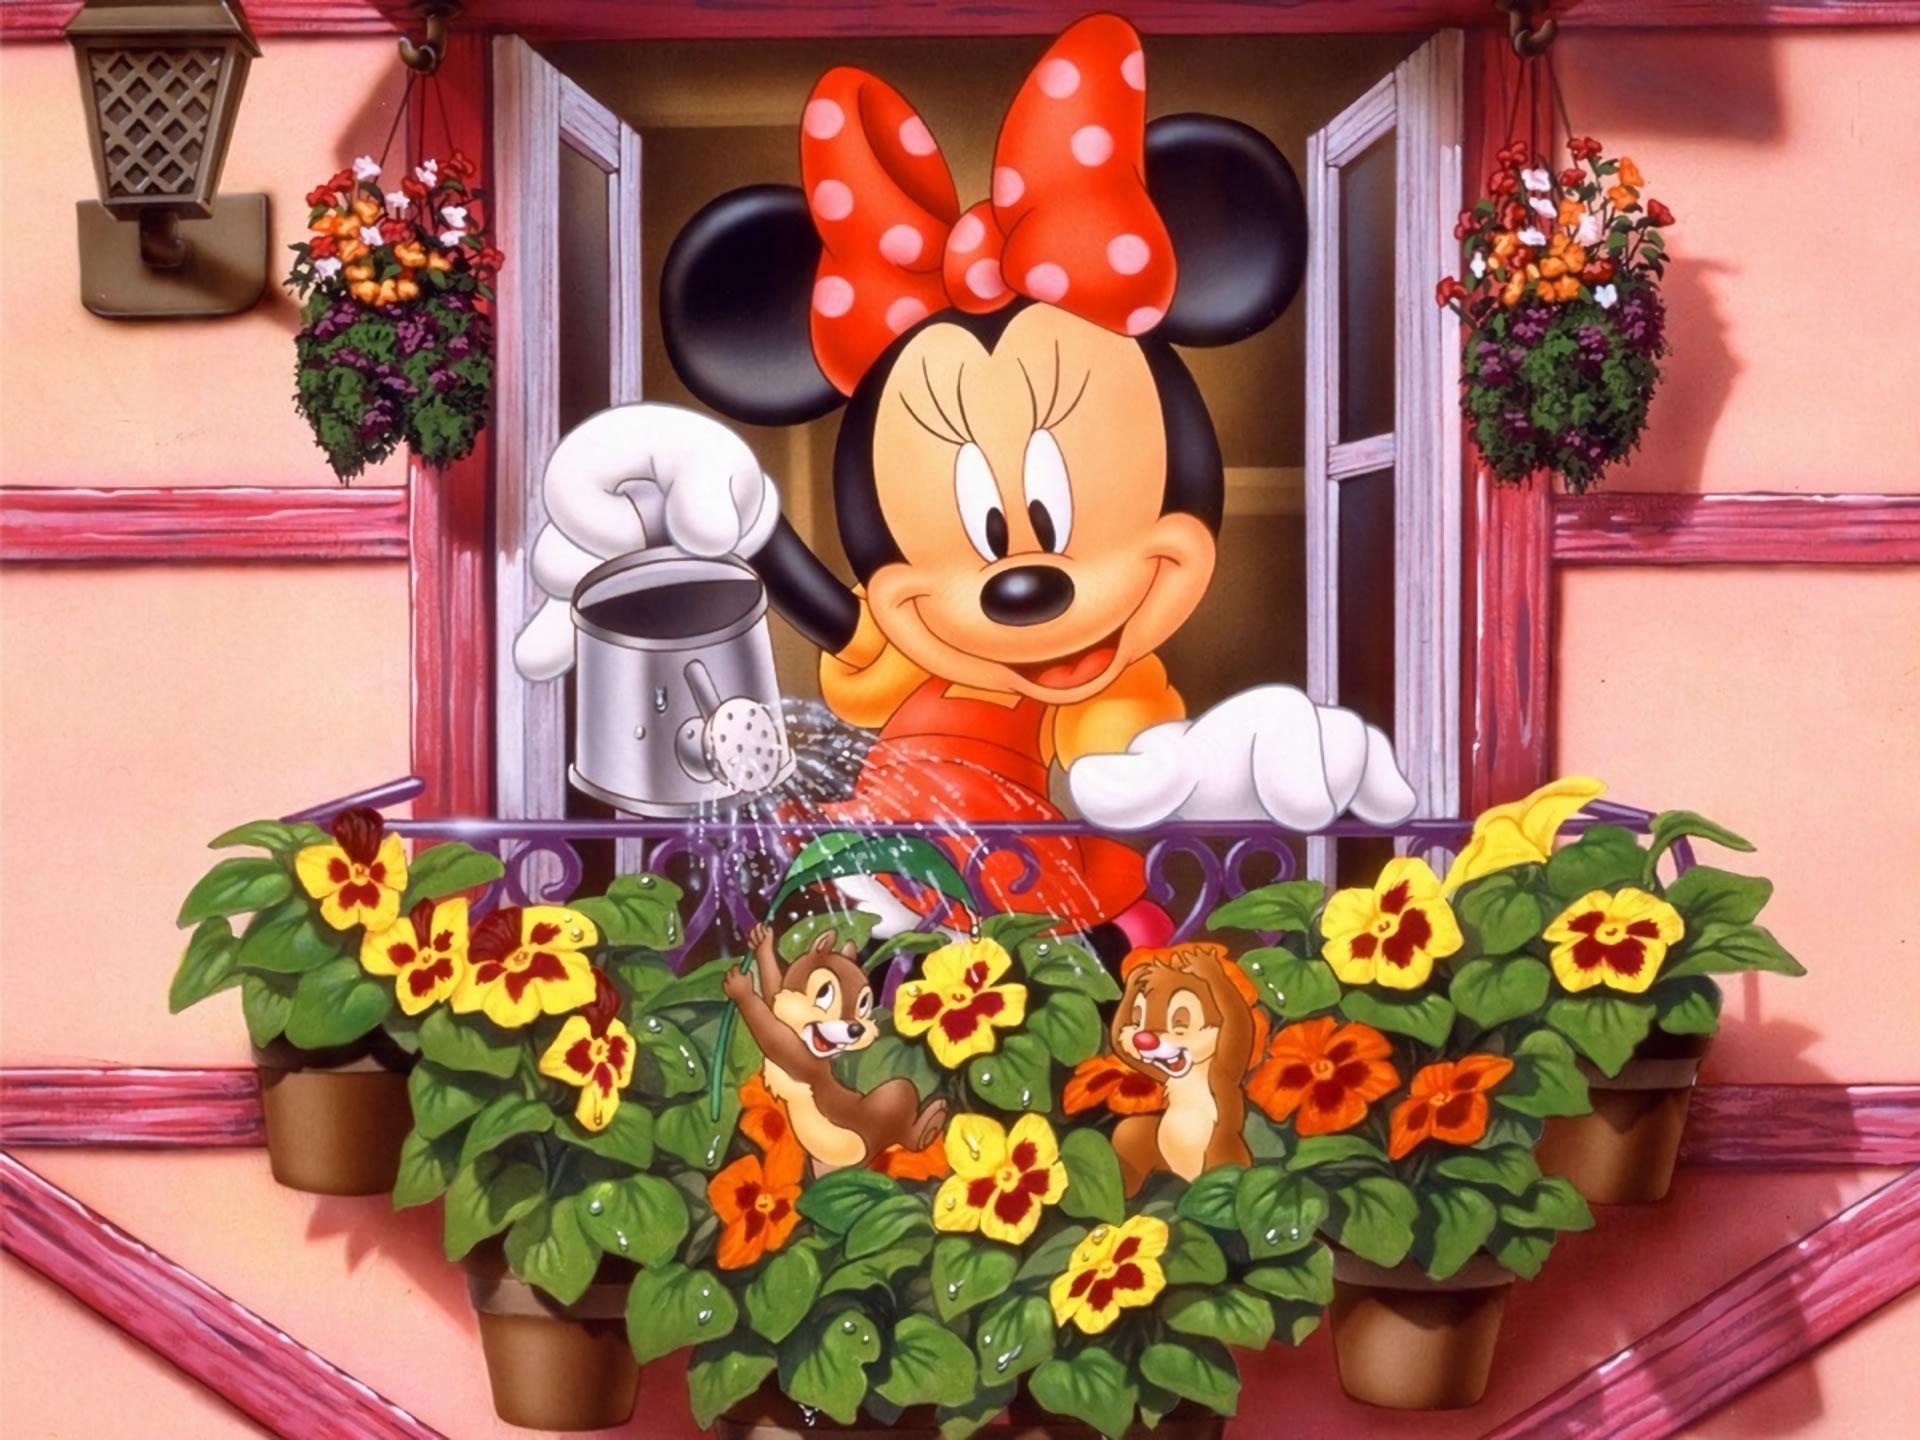 Leuk Voor Kids Minnie Mouse Met Knabbel Babbel